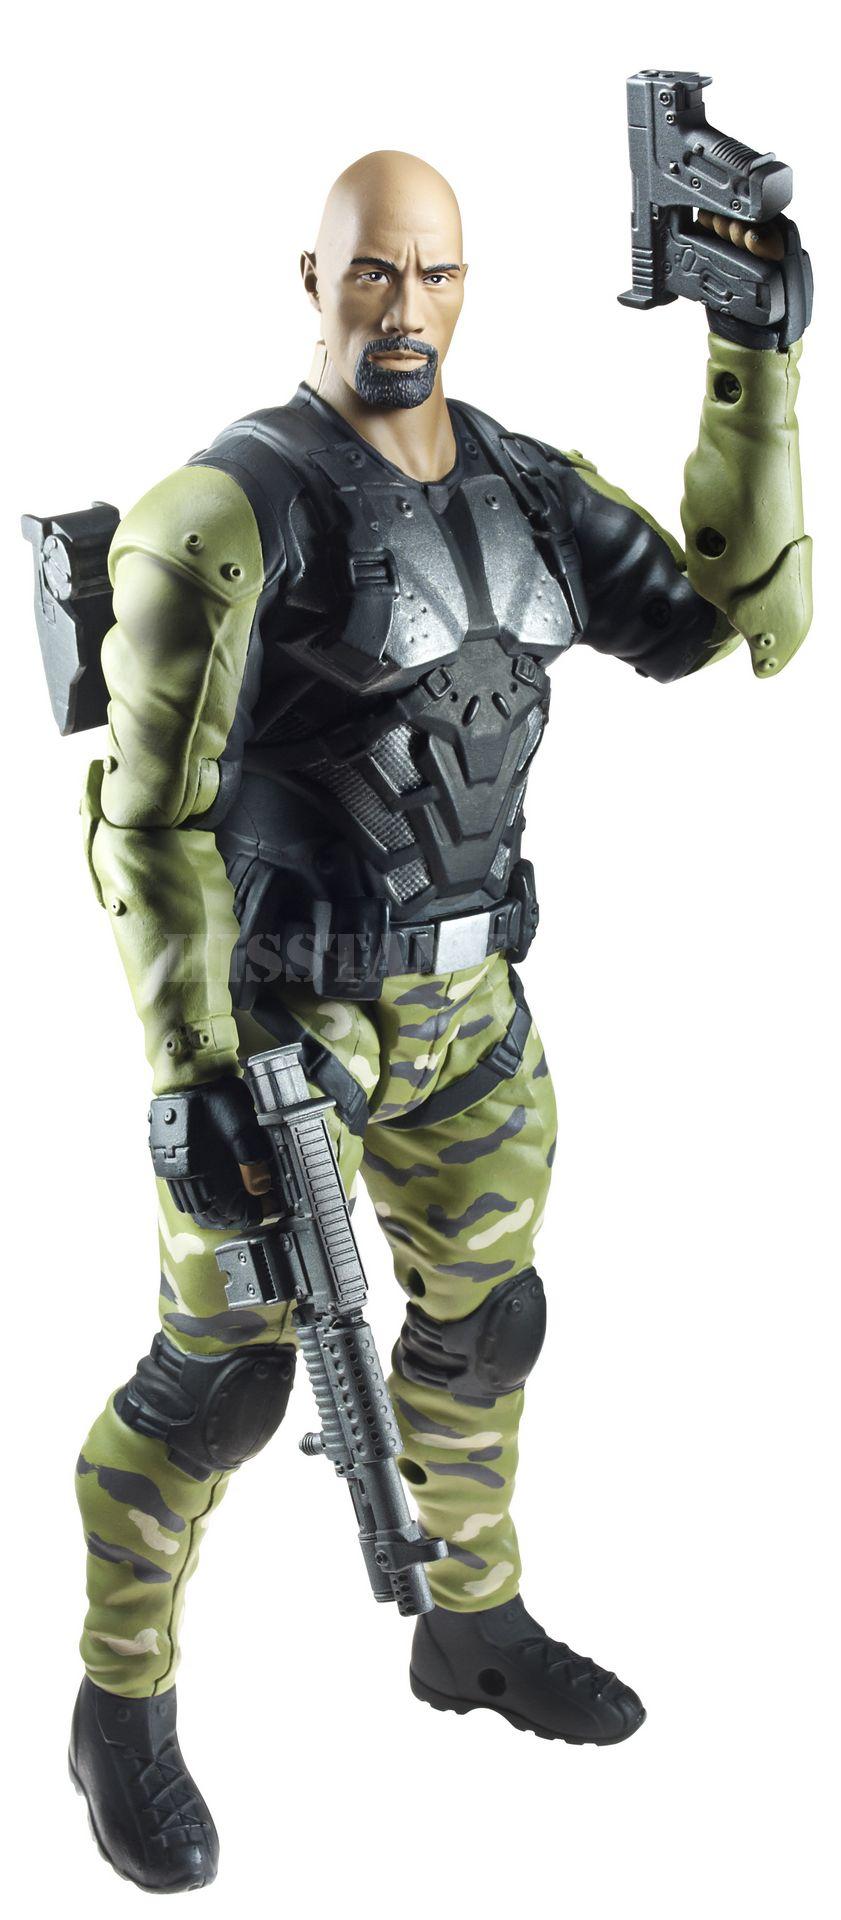 G.I. Joe Retaliation Movie Toys - Battlers - High Res ...